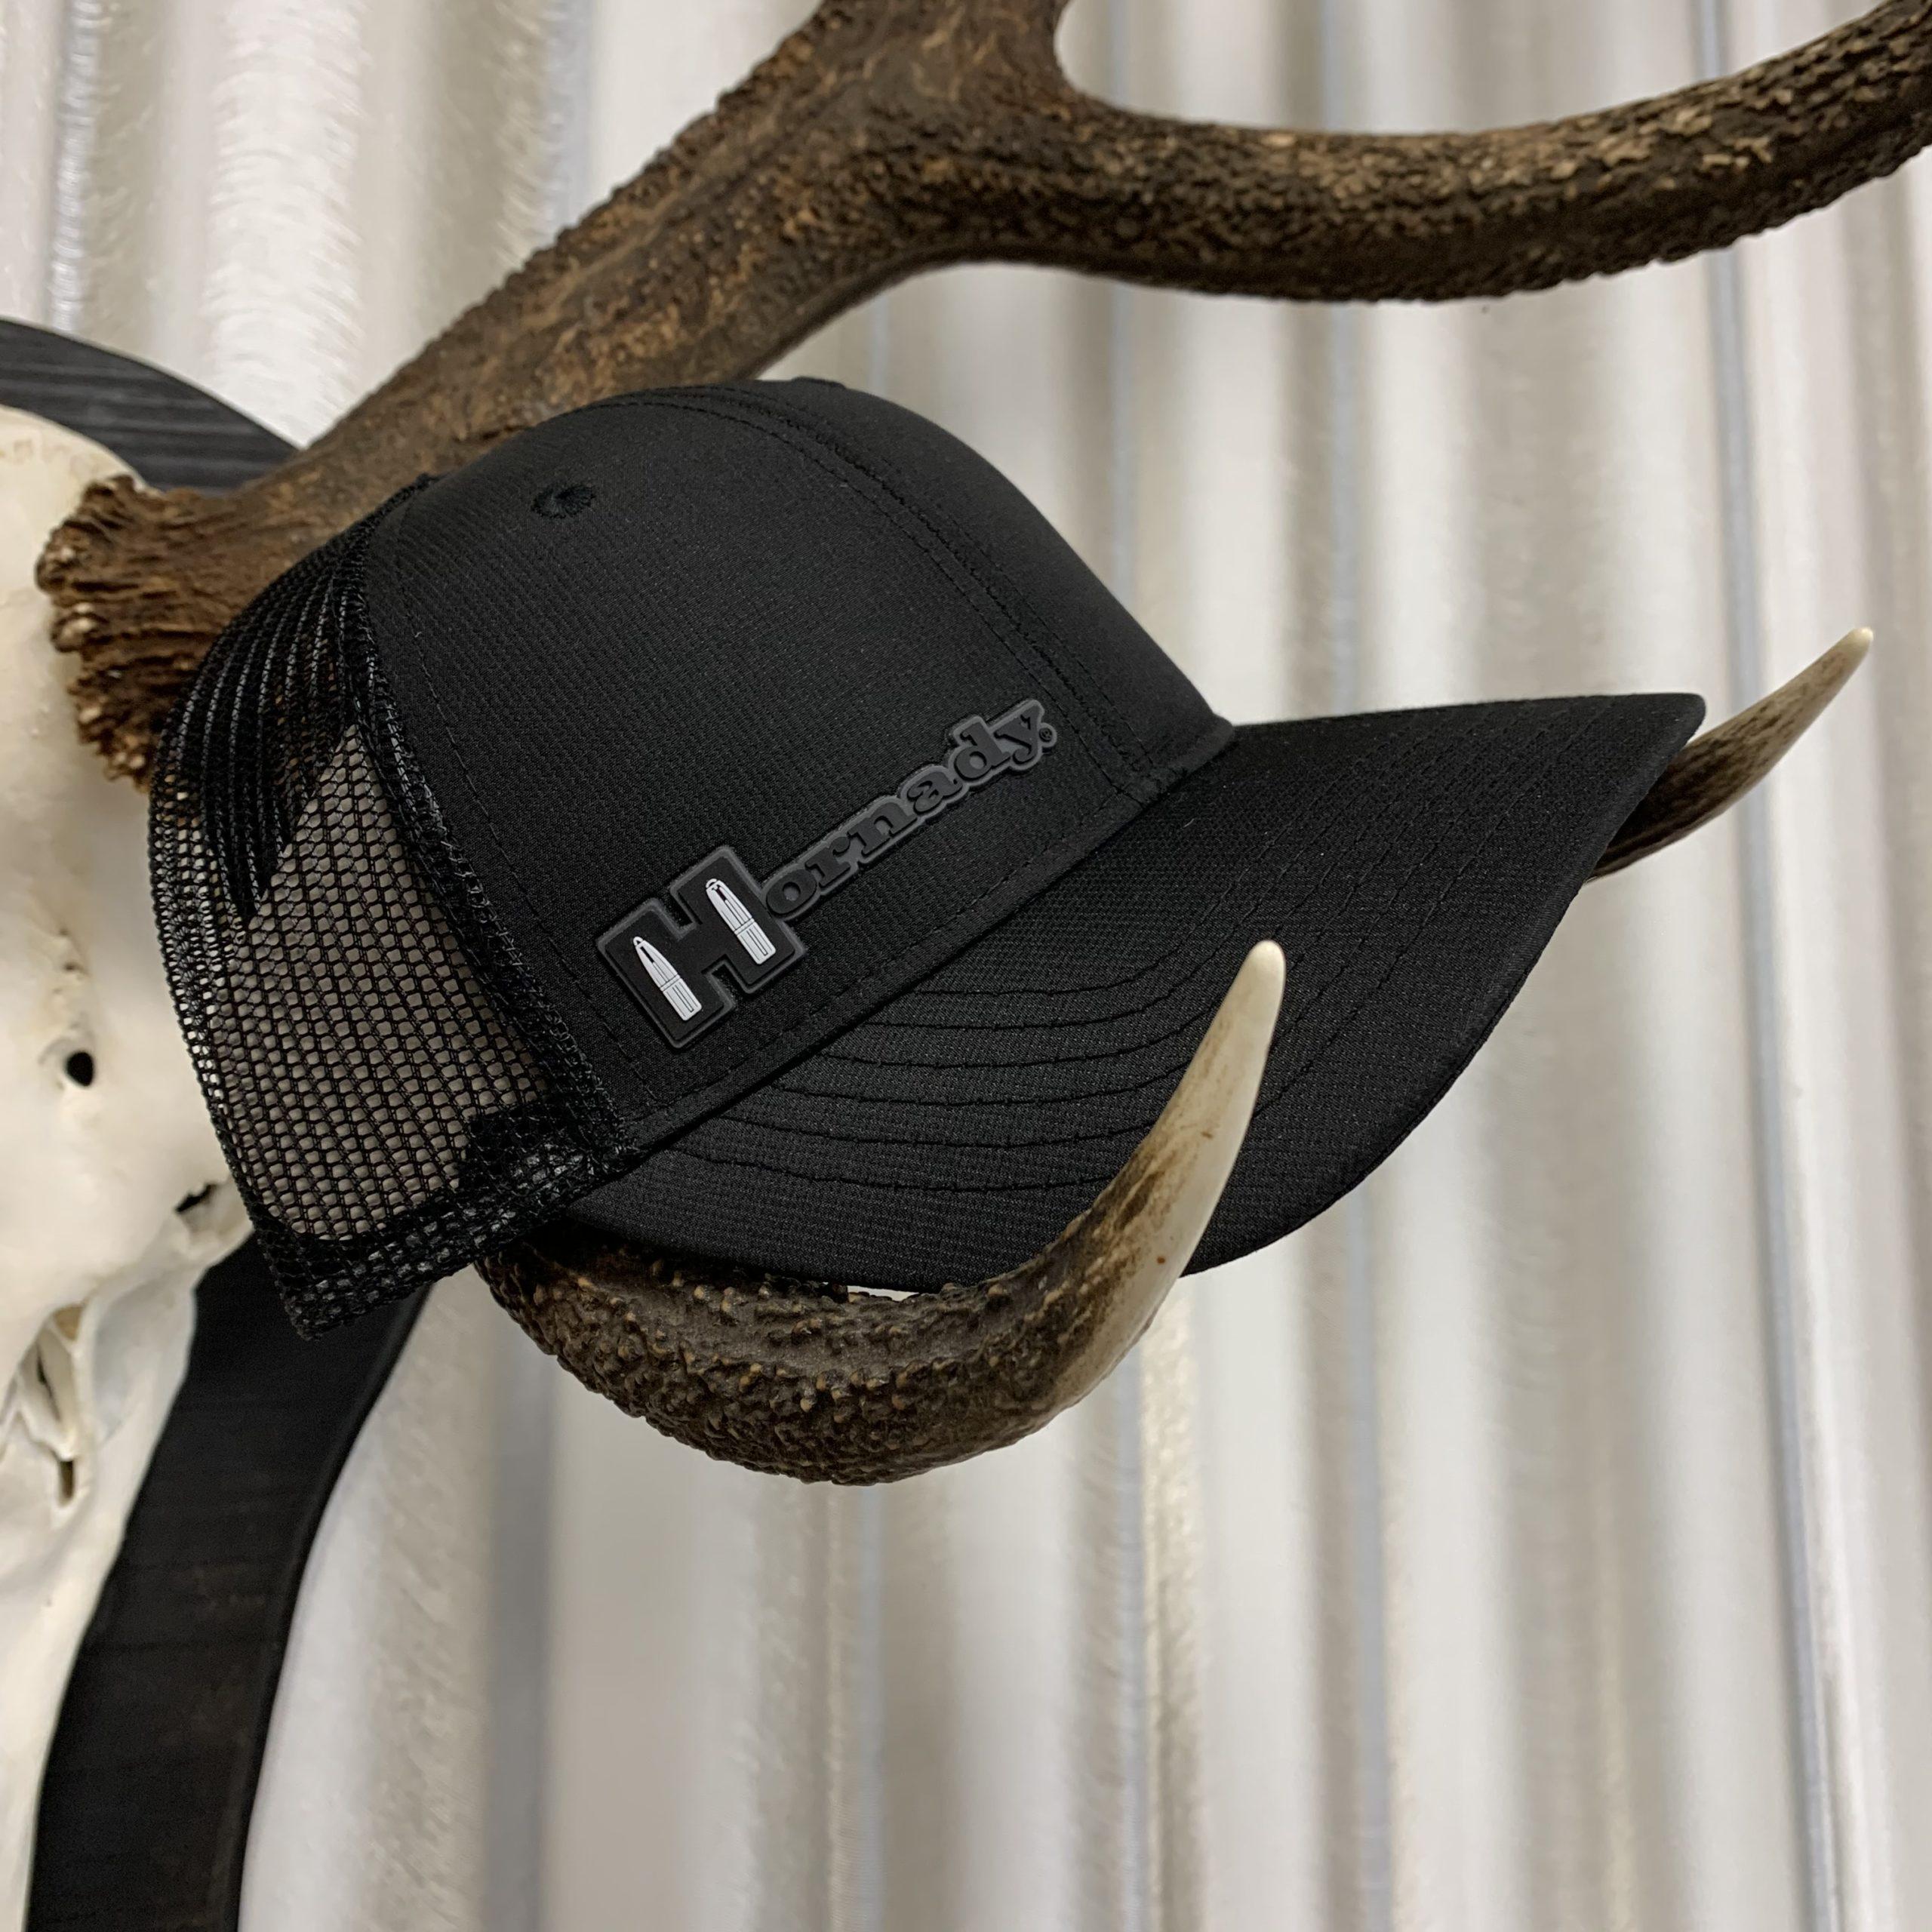 Hornady Base Cap Black Sniper Mesh Cap Special Edition Hornady Gear